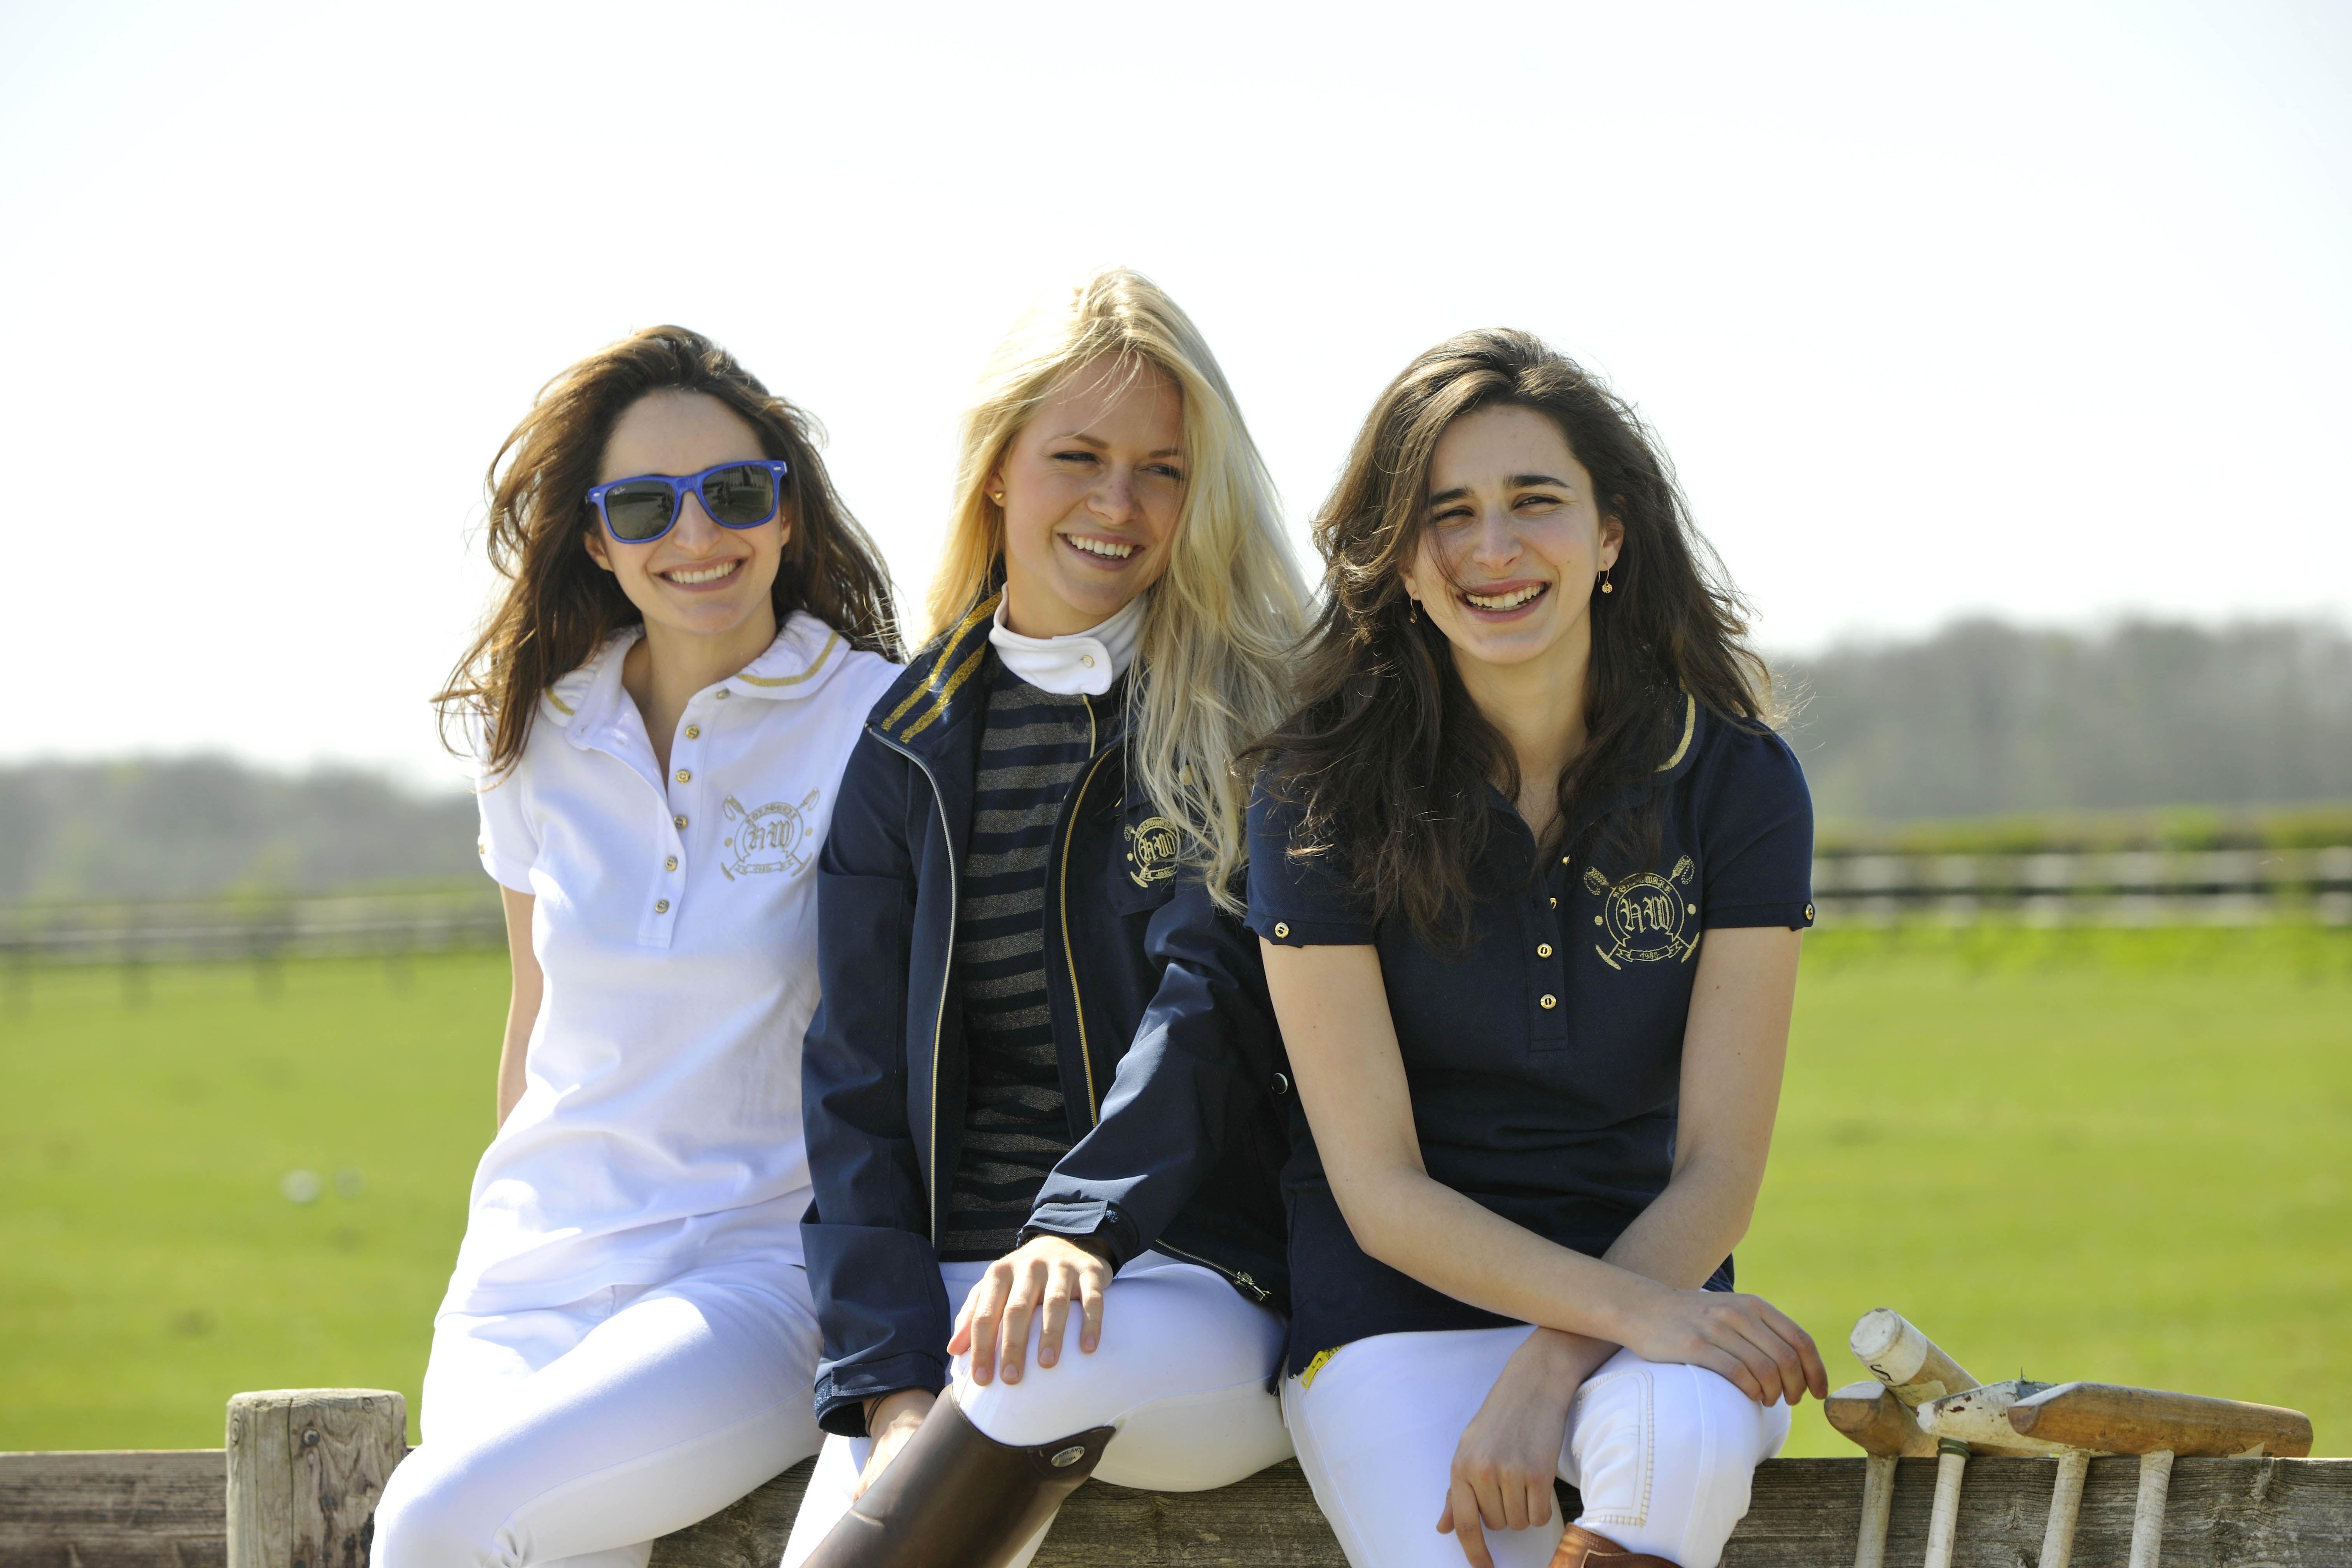 Horseware Polo S/S14: Maddie polo / Gisele jacket / Bibi sleeveless polo / Elise breeches